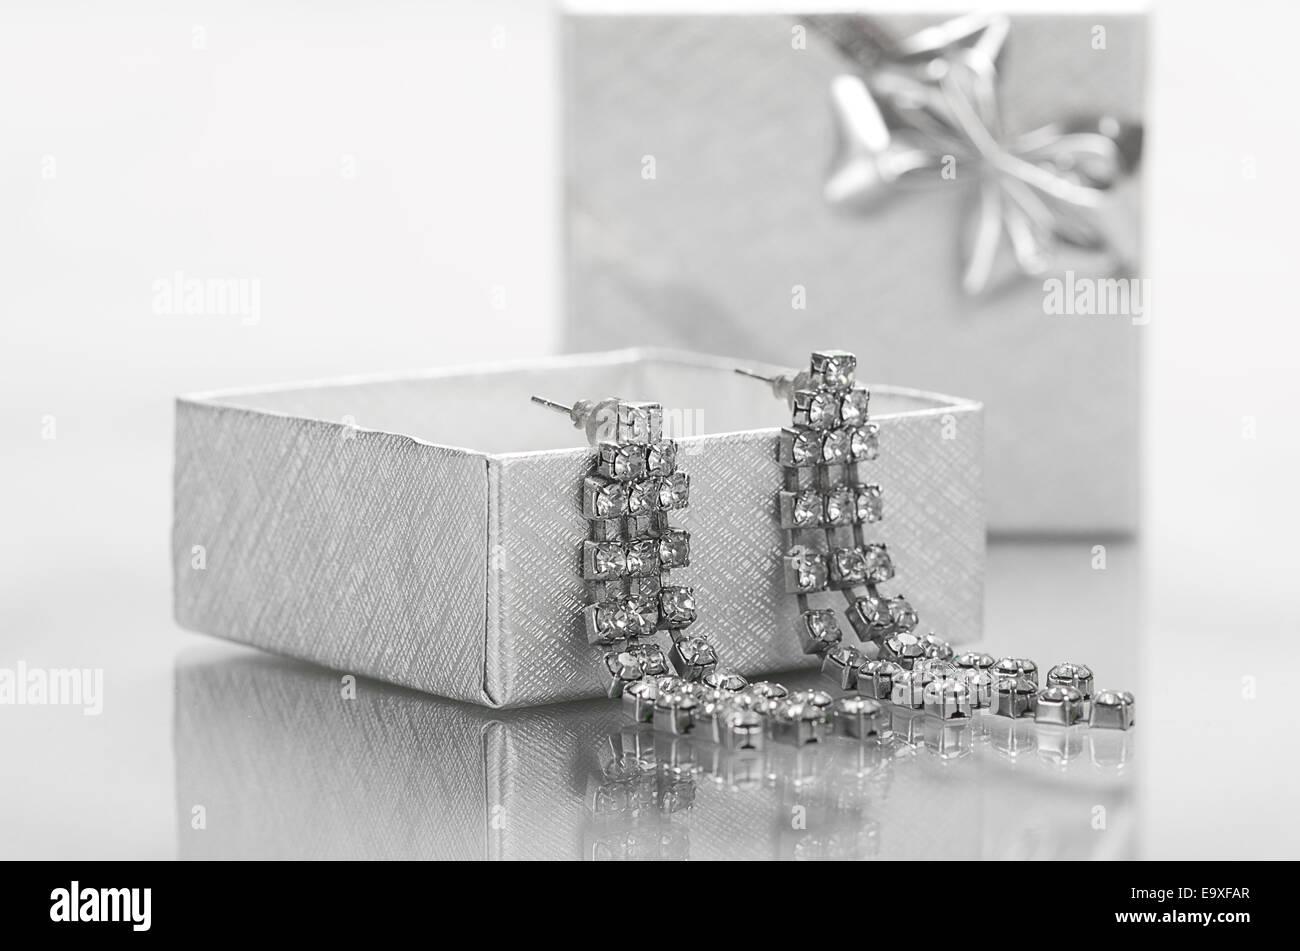 Earrings in a silver box. - Stock Image